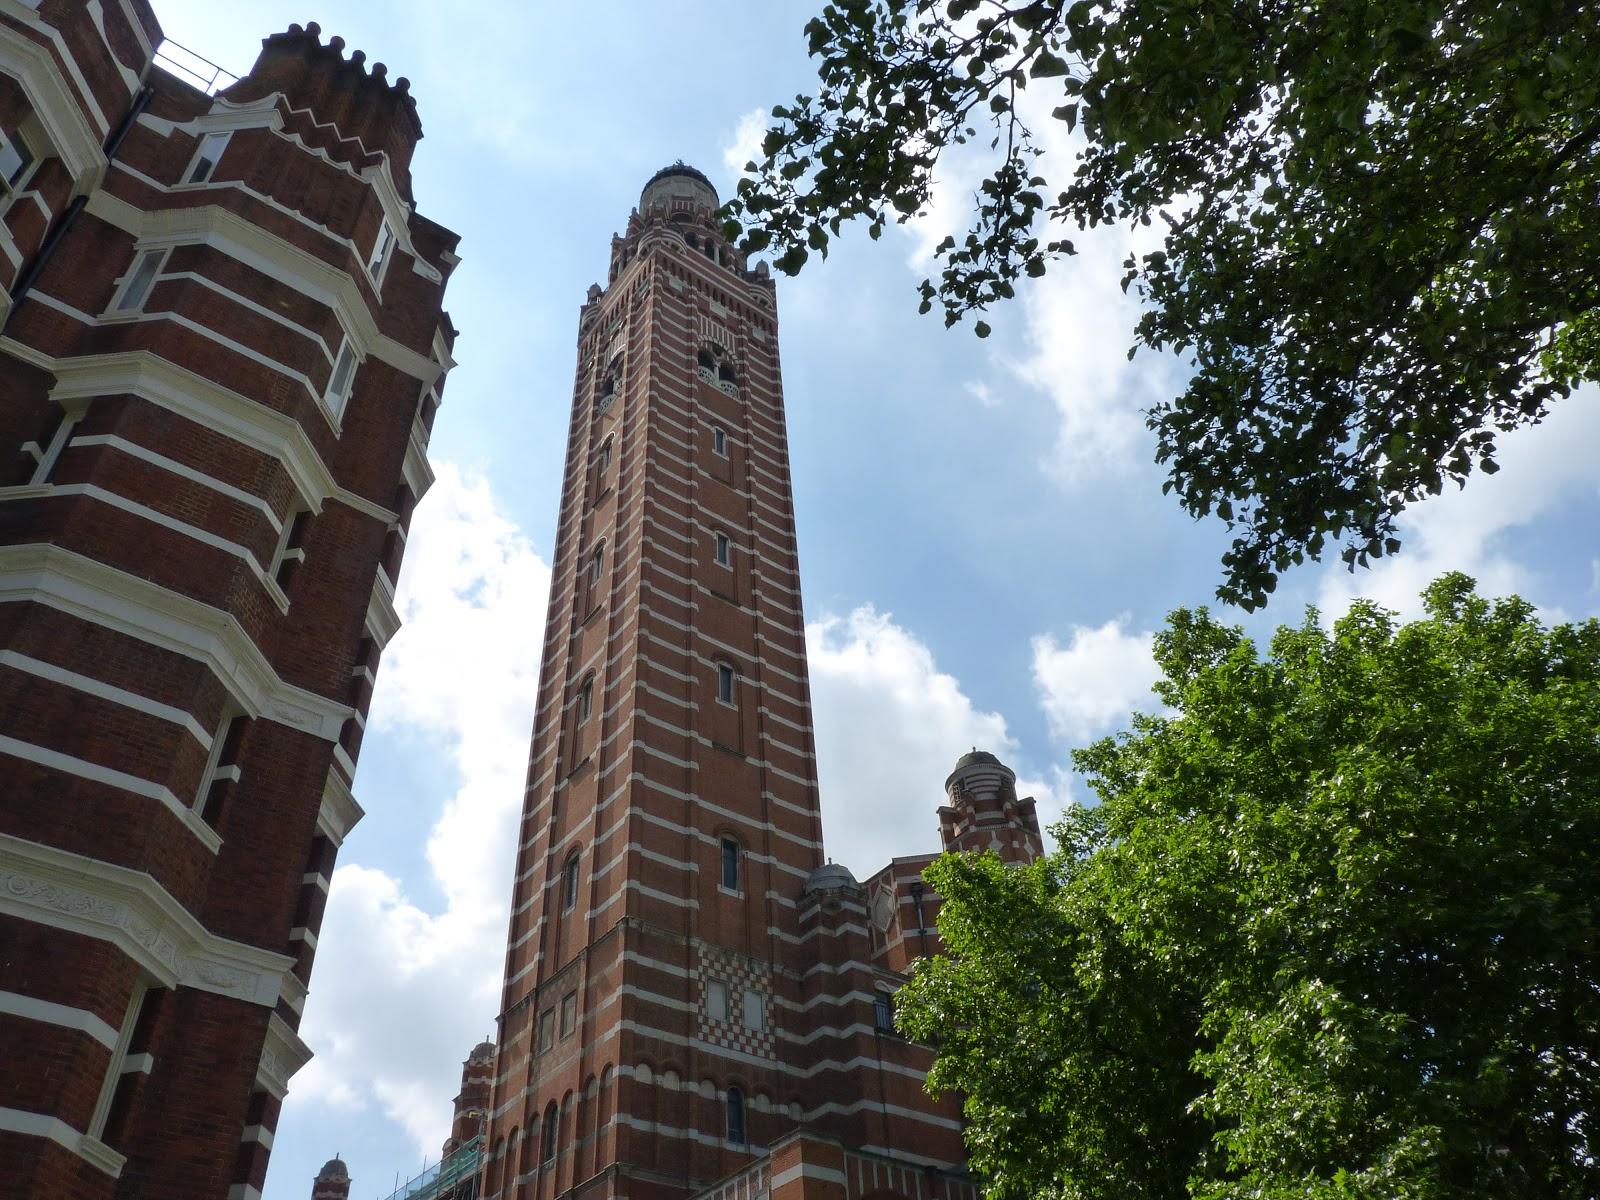 Cathédrale de Westminster